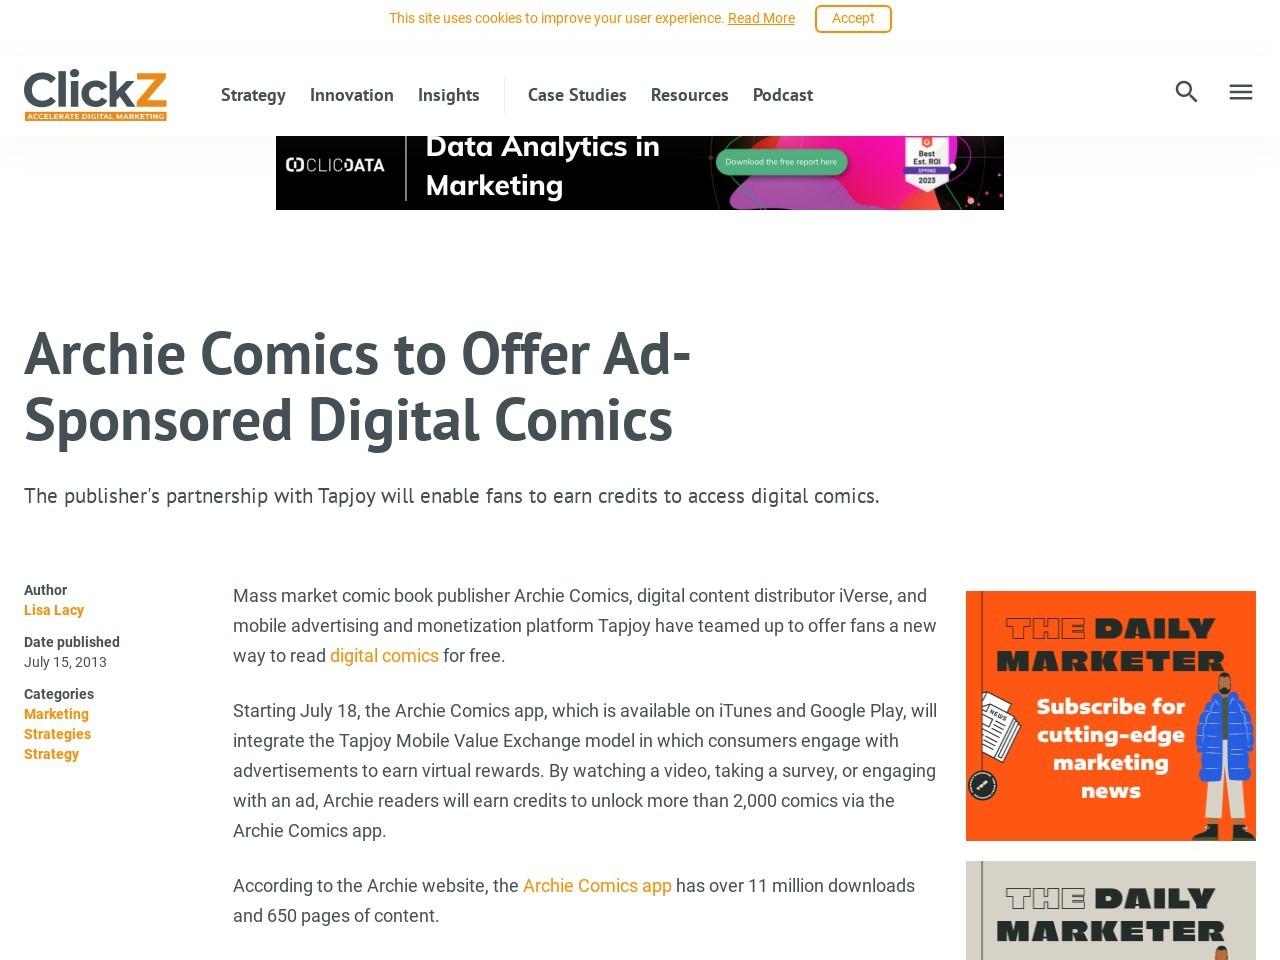 Archie Comics to Offer Ad-Sponsored Digital Comics